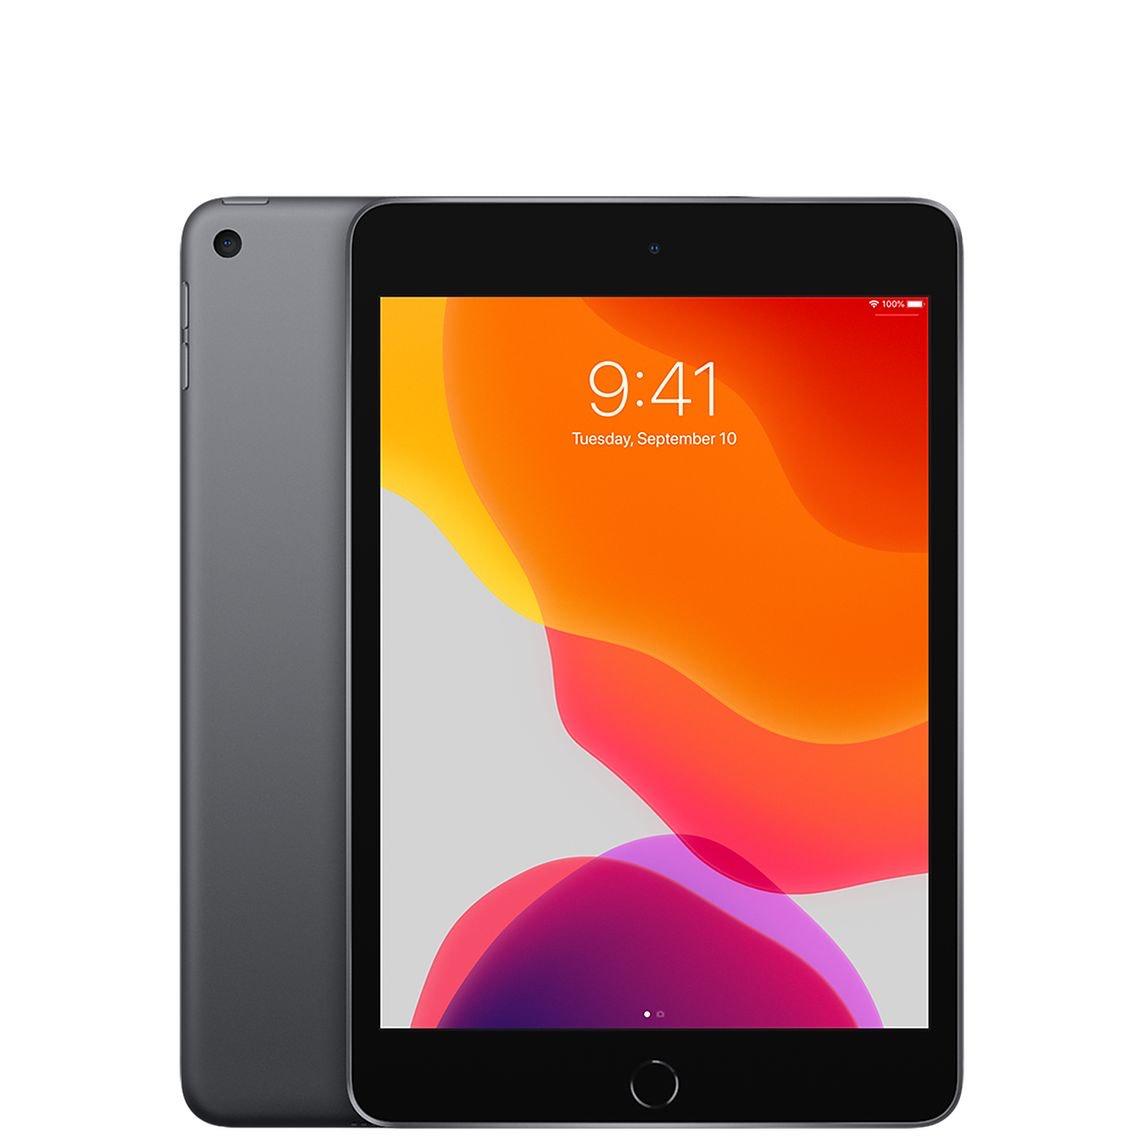 Refurbished iPad mini 5 Wi-Fi 64GB - £339 delivered @ Apple Store